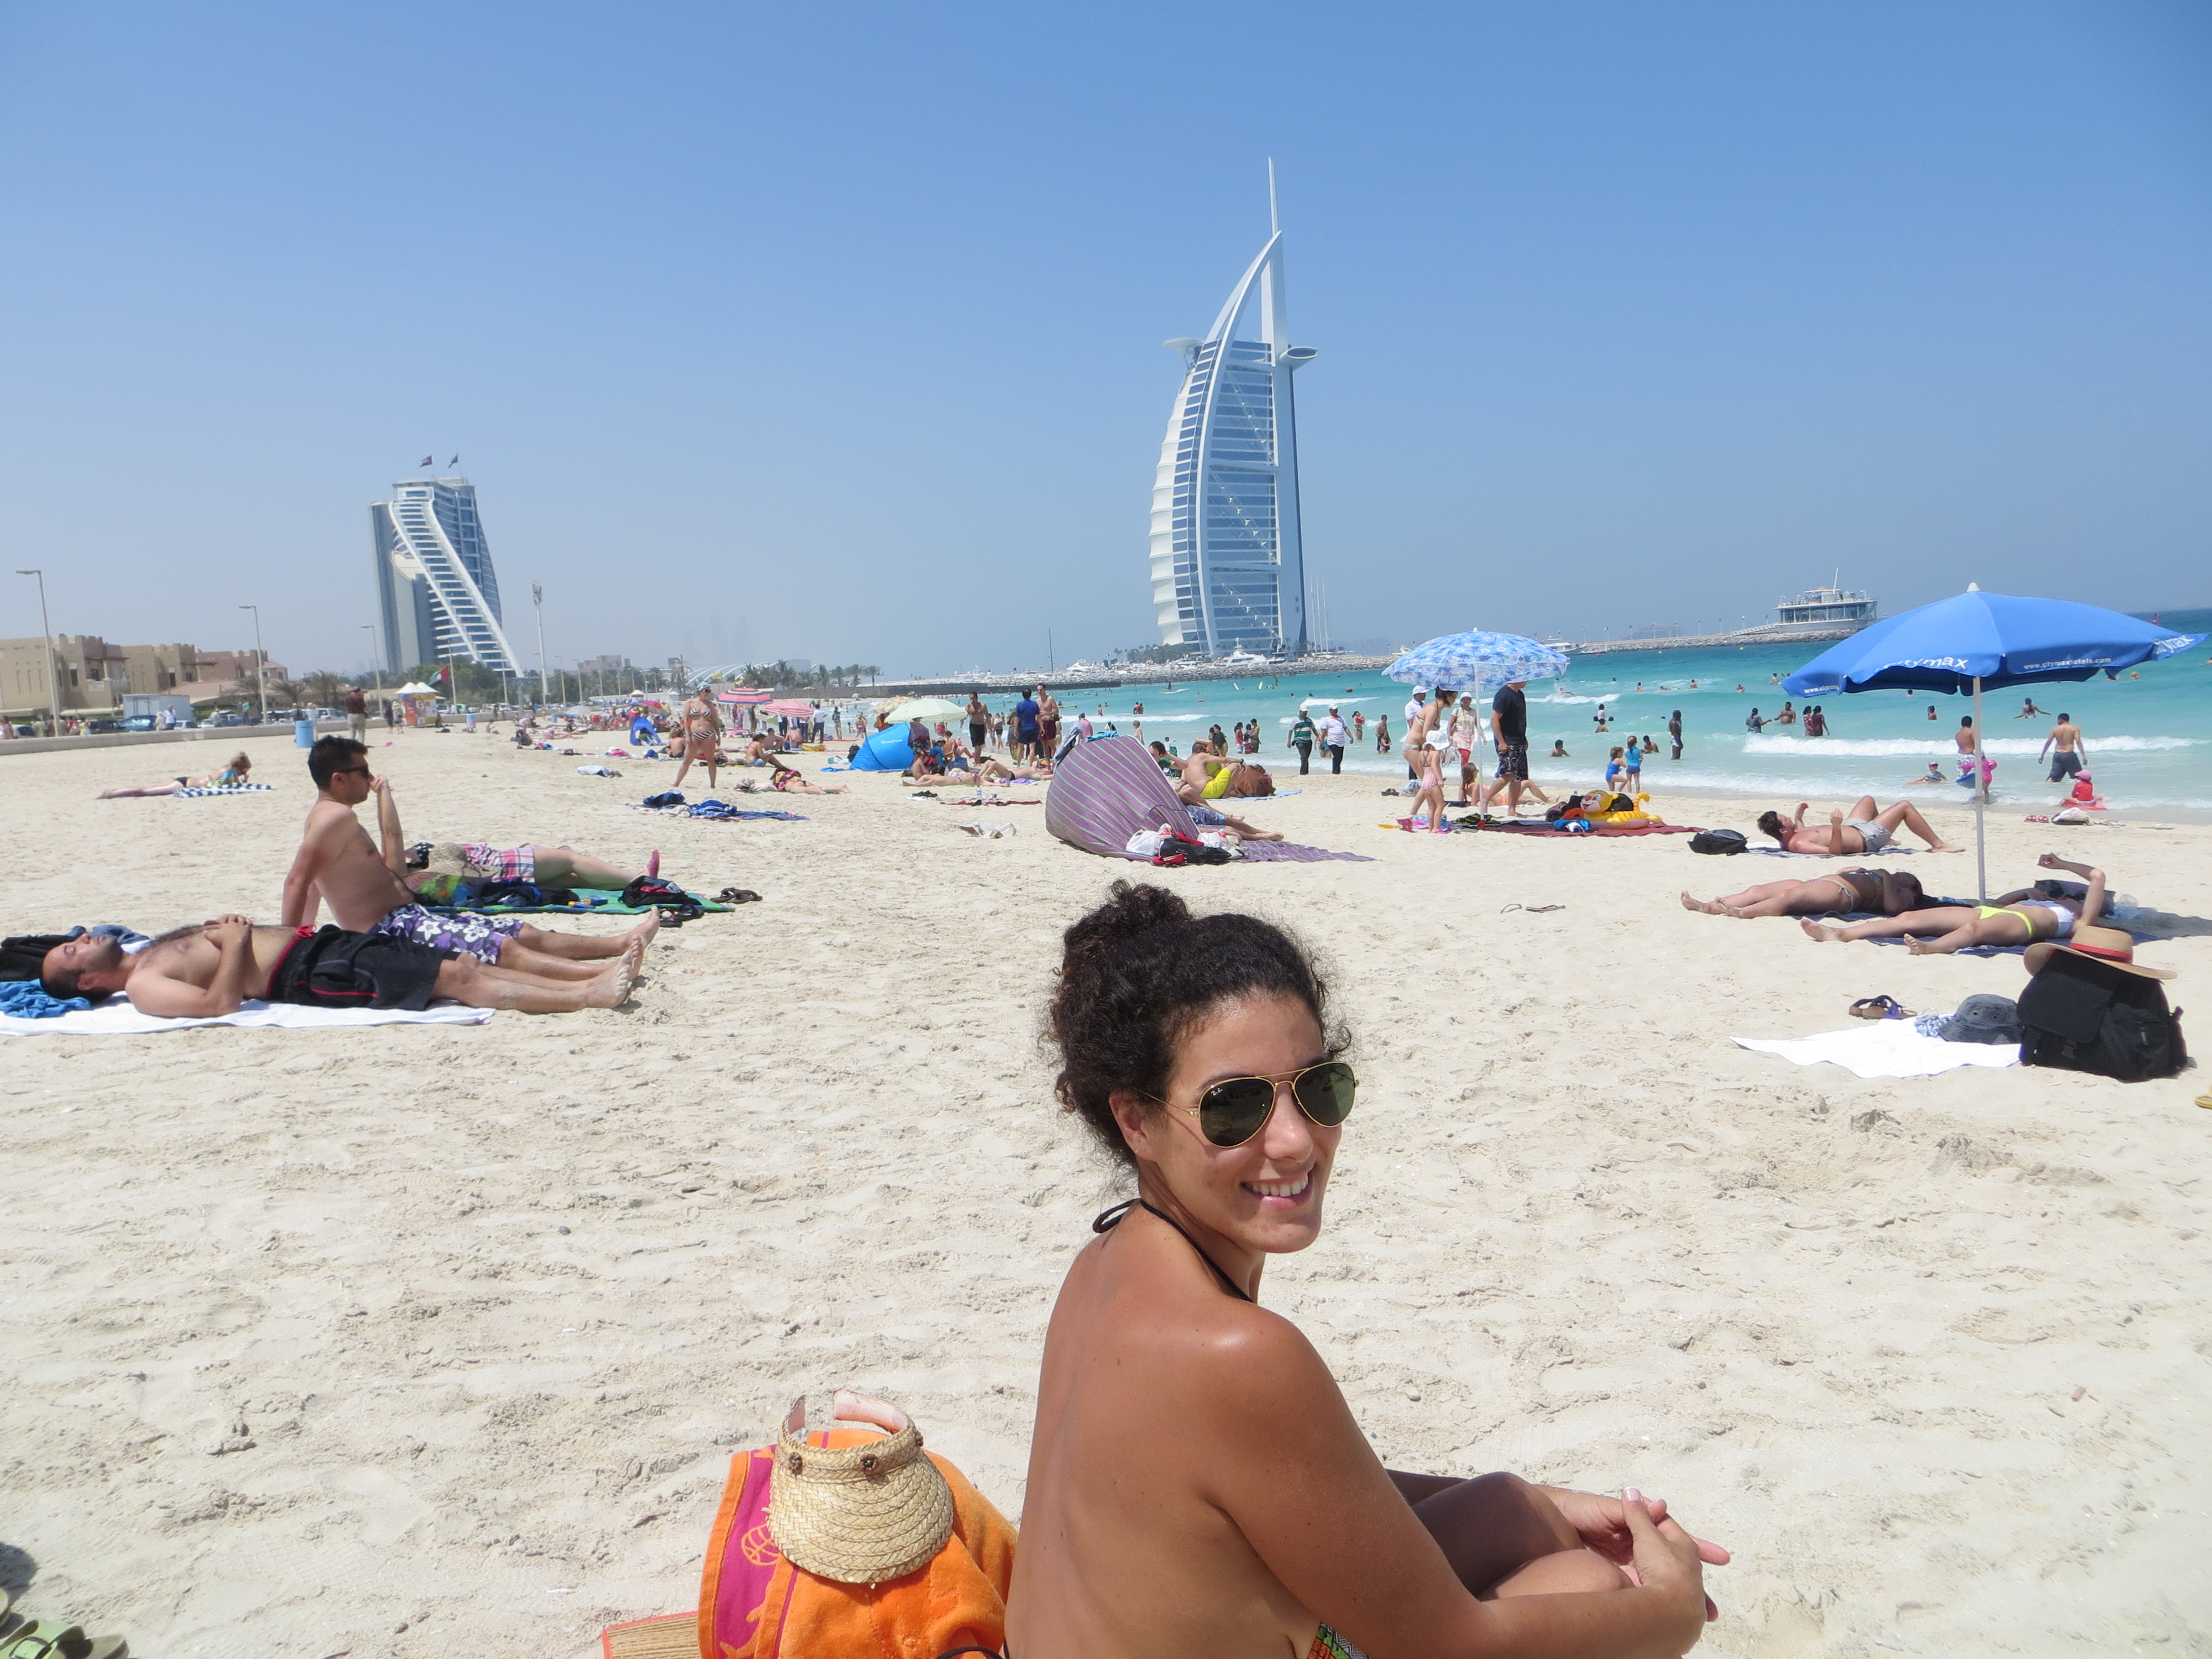 Posh Naked Female Images Finnish Leanna Hailie Michelle Dubai Uae